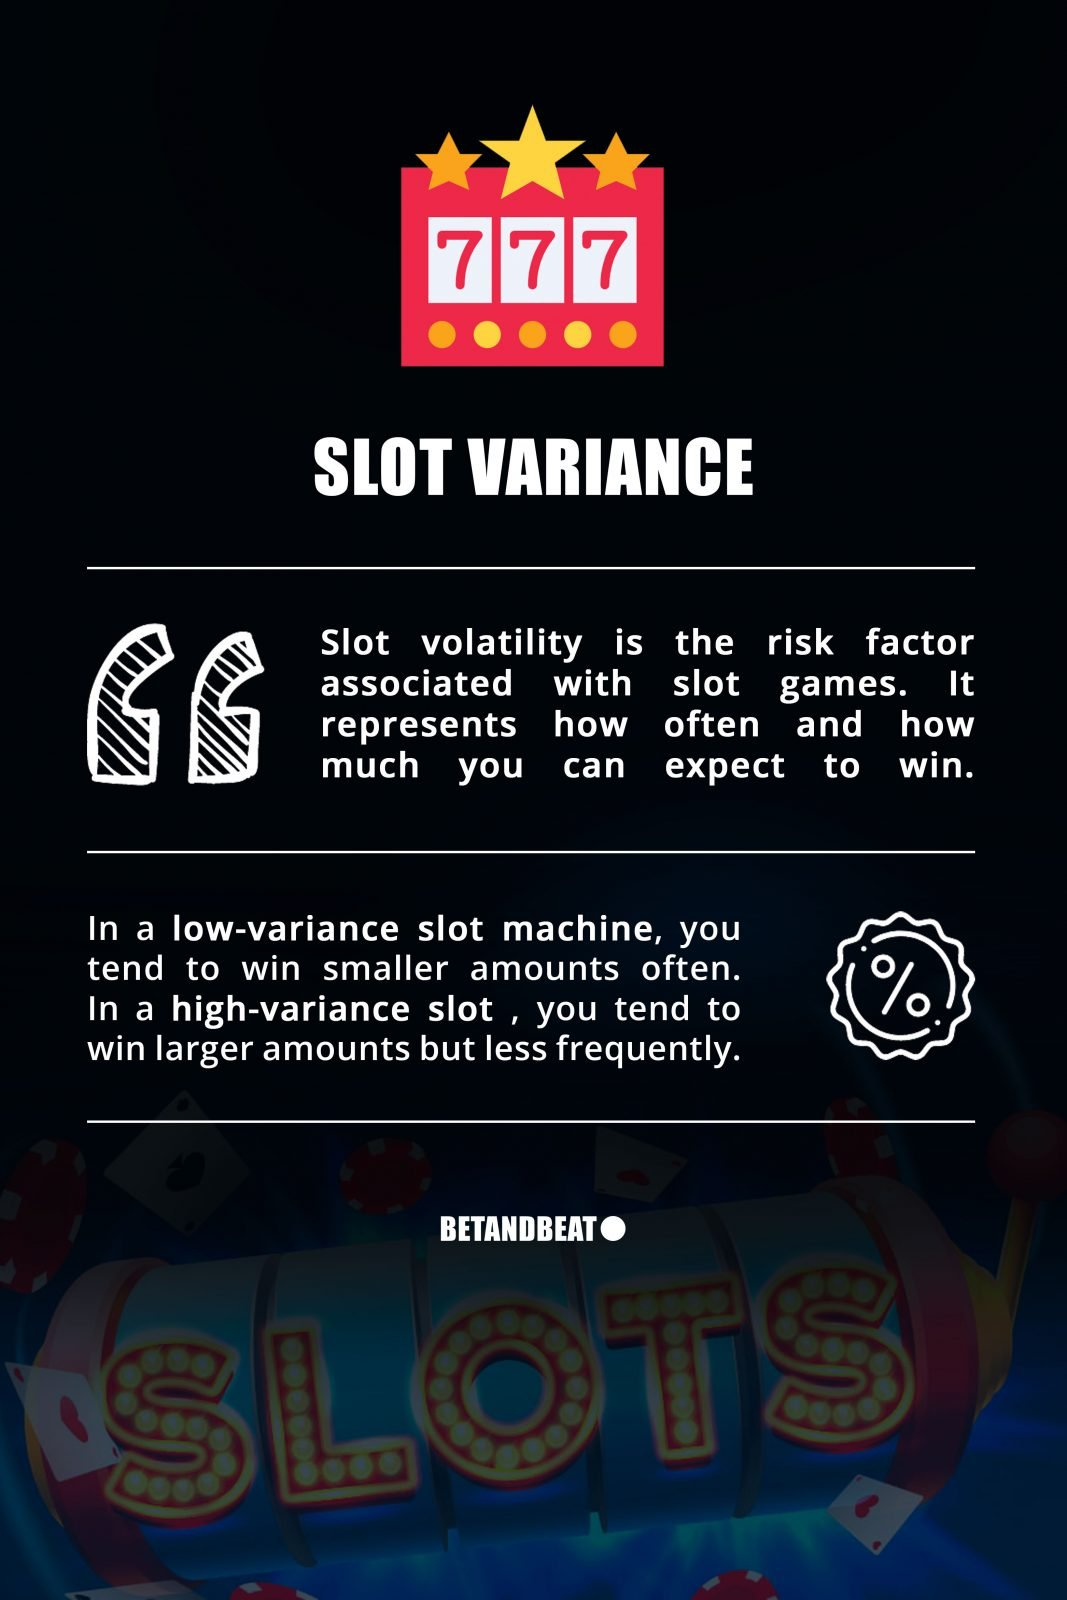 slots variance